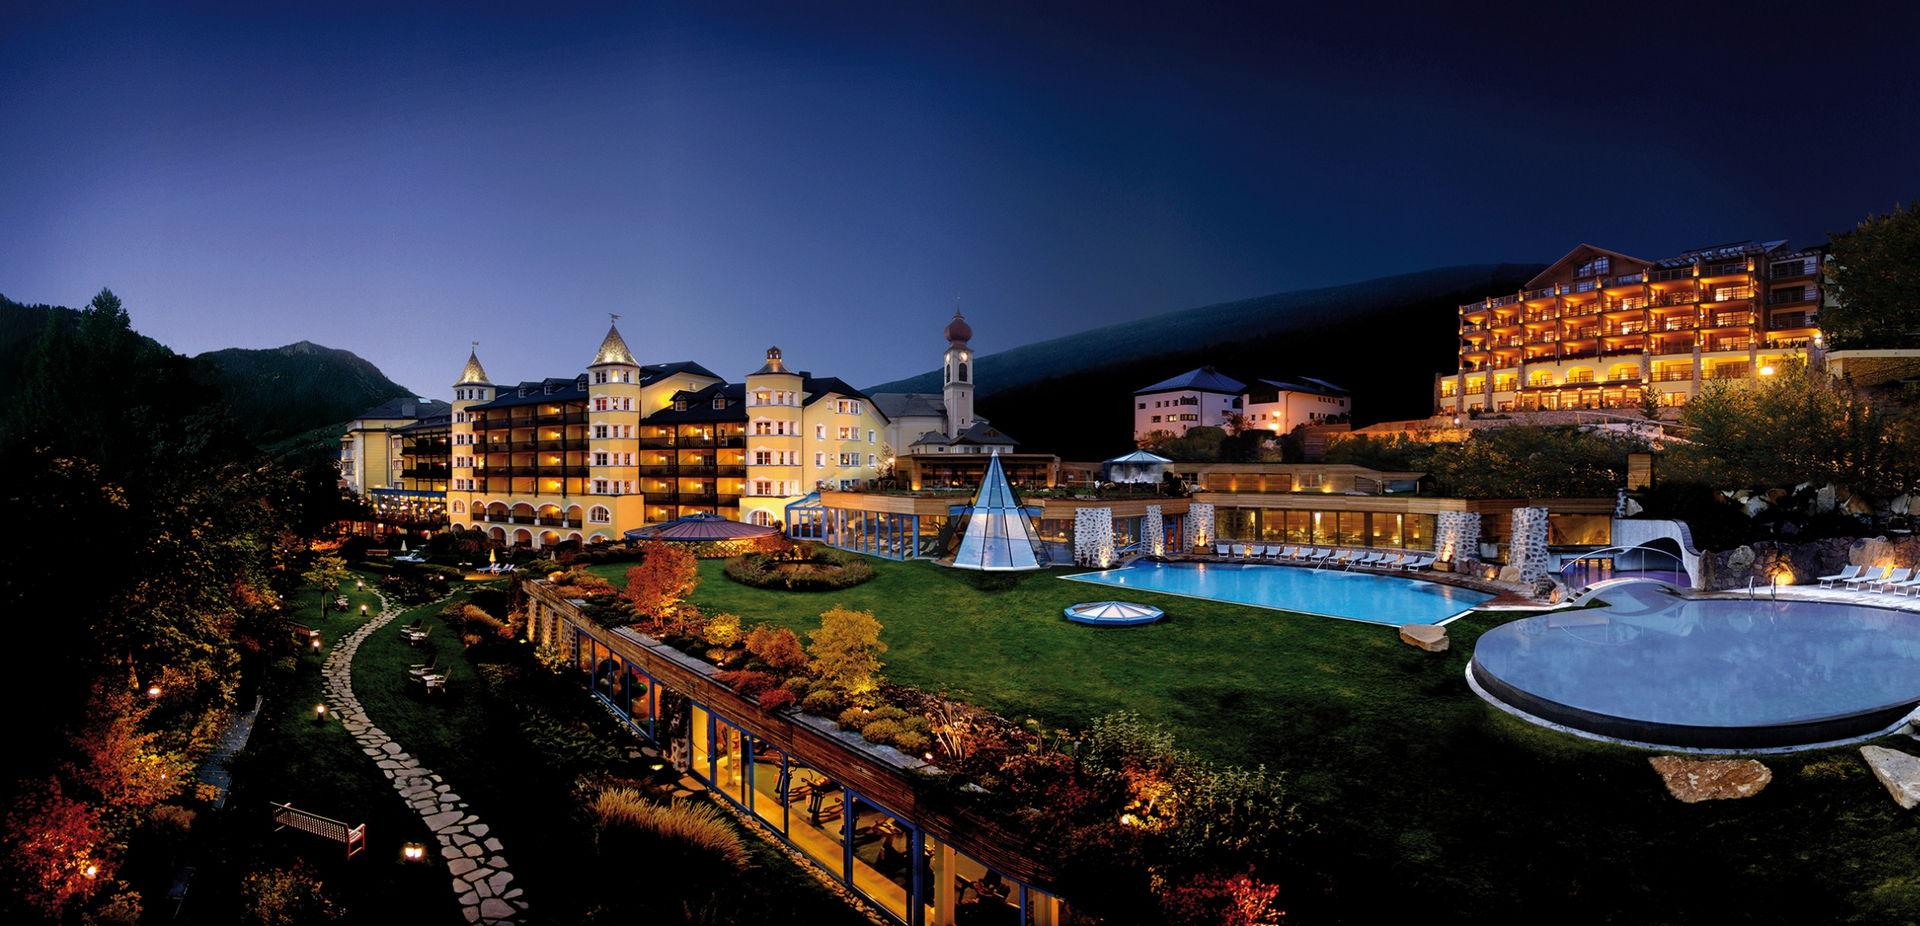 Hotel Adler Dolomiti Spa  Sport Resort Review  GTspirit